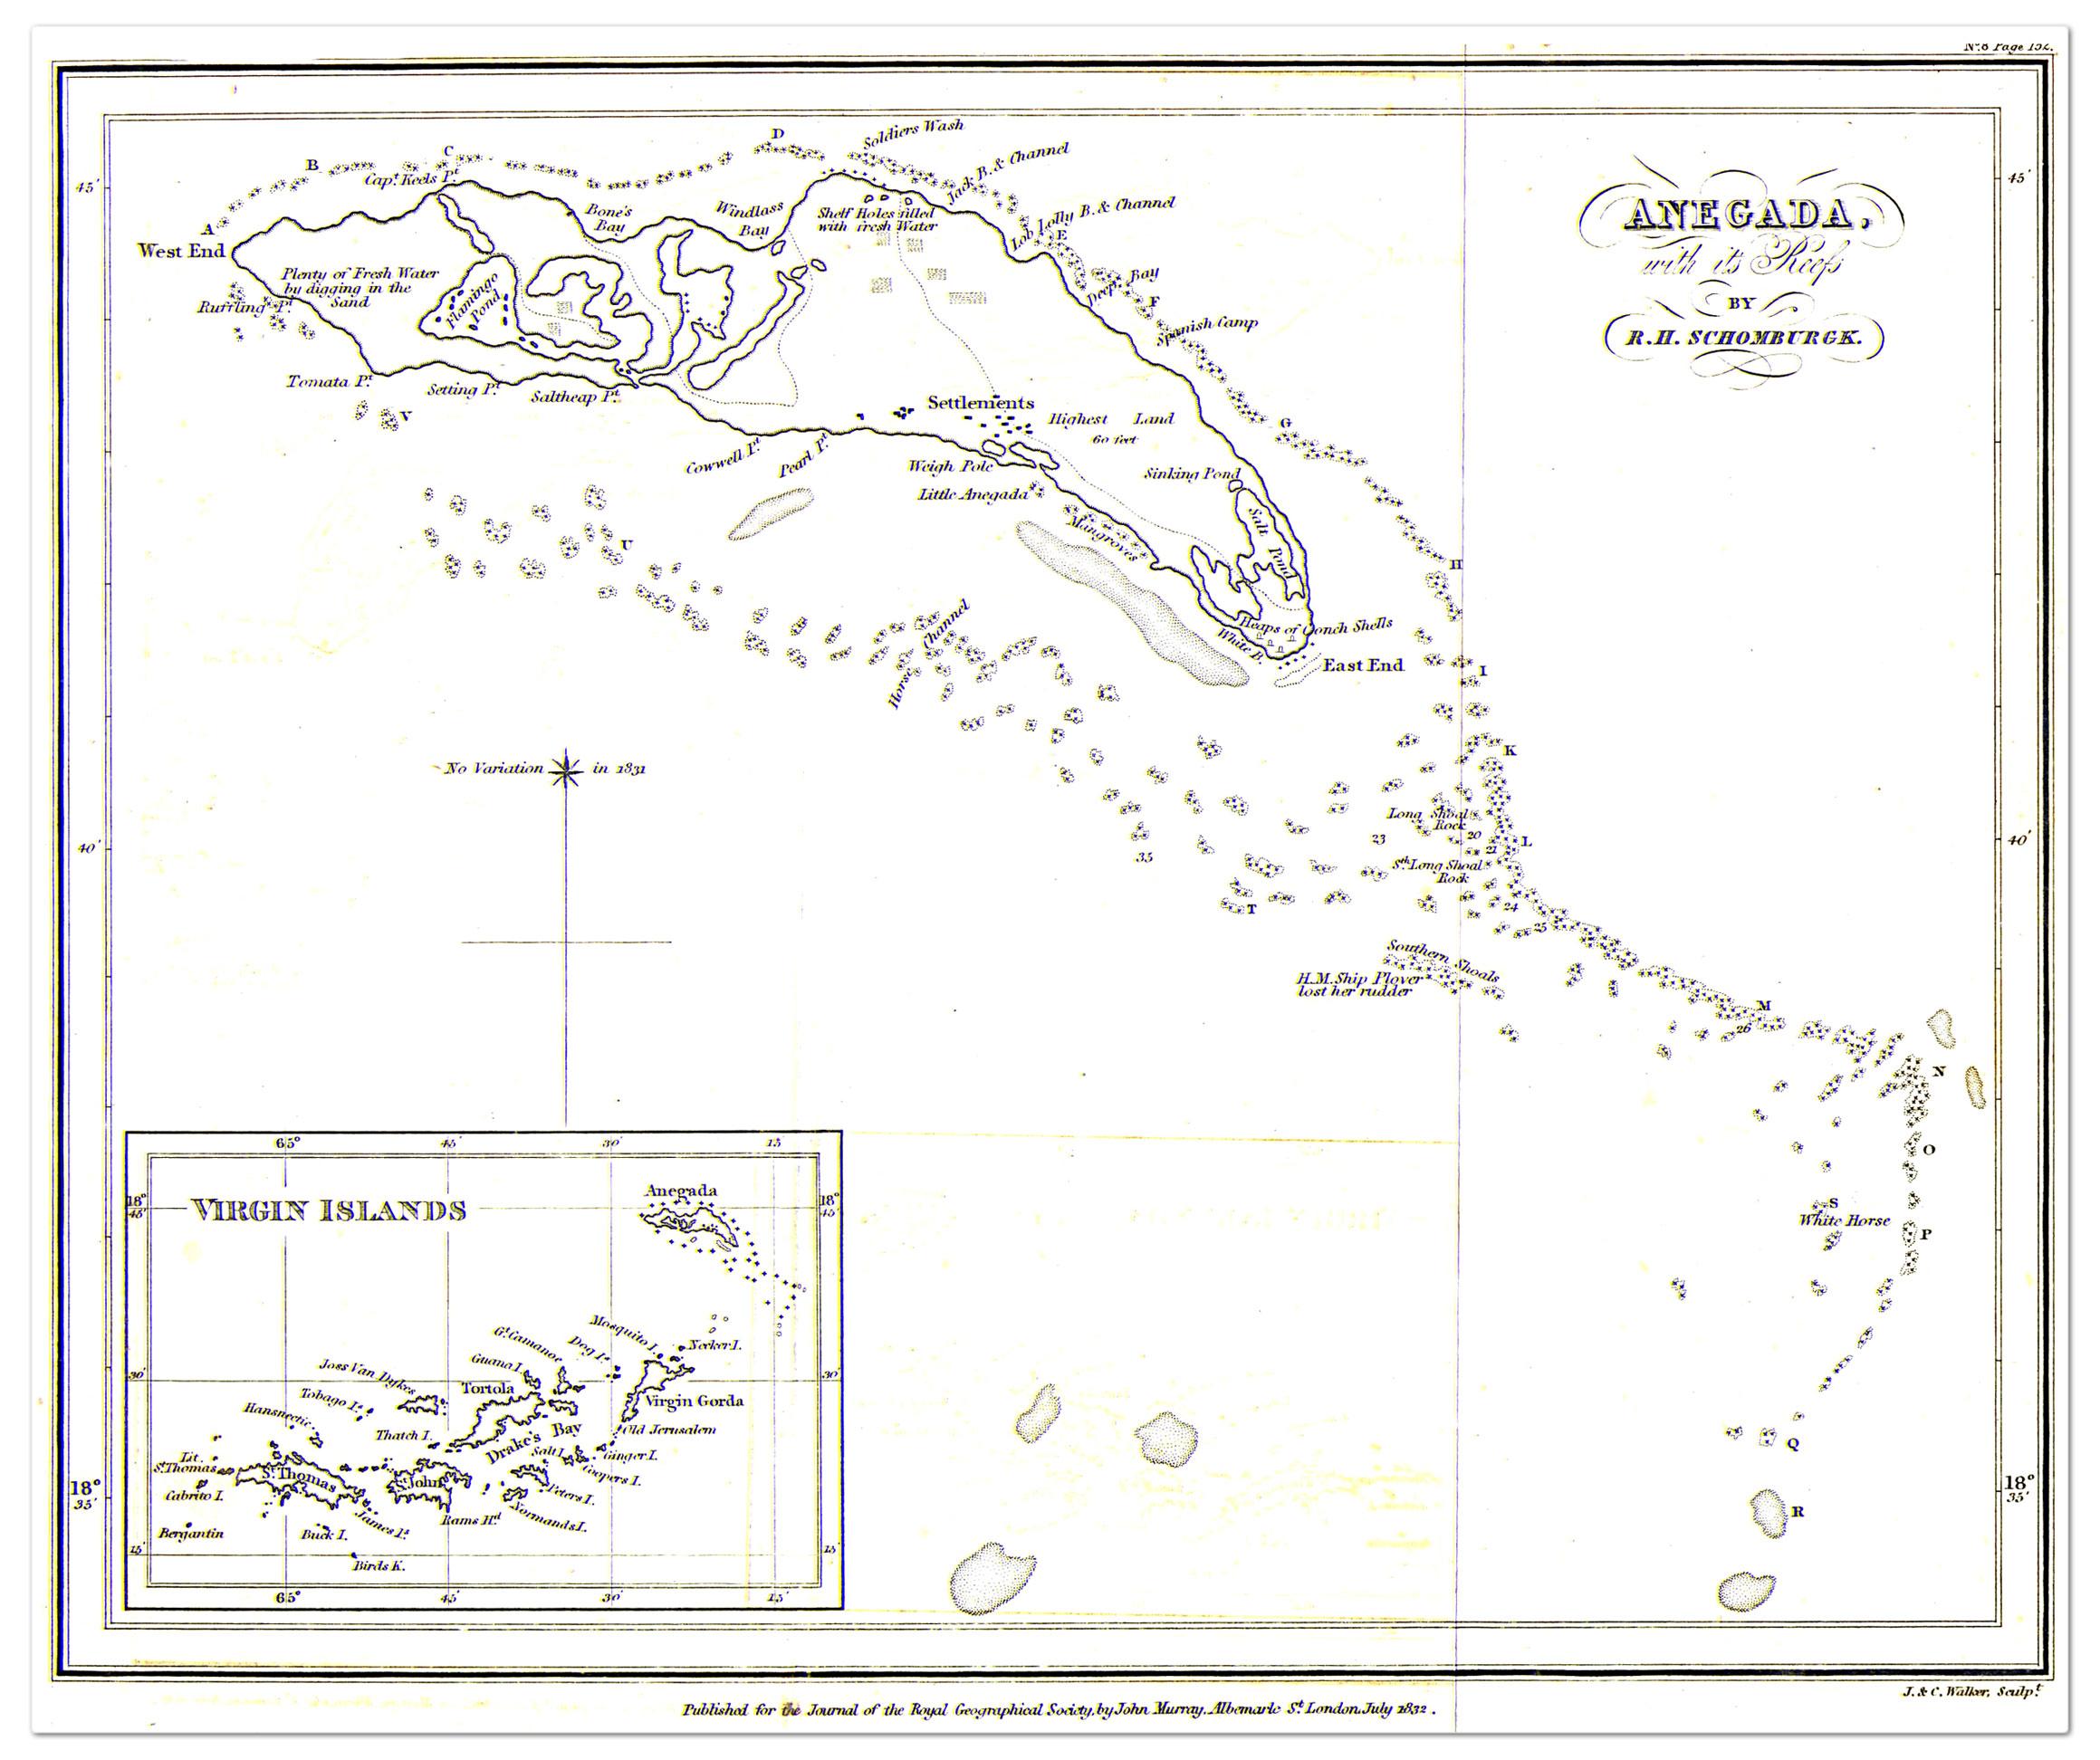 Anegada British Virgin Islands Map 1832 Philatelic Database